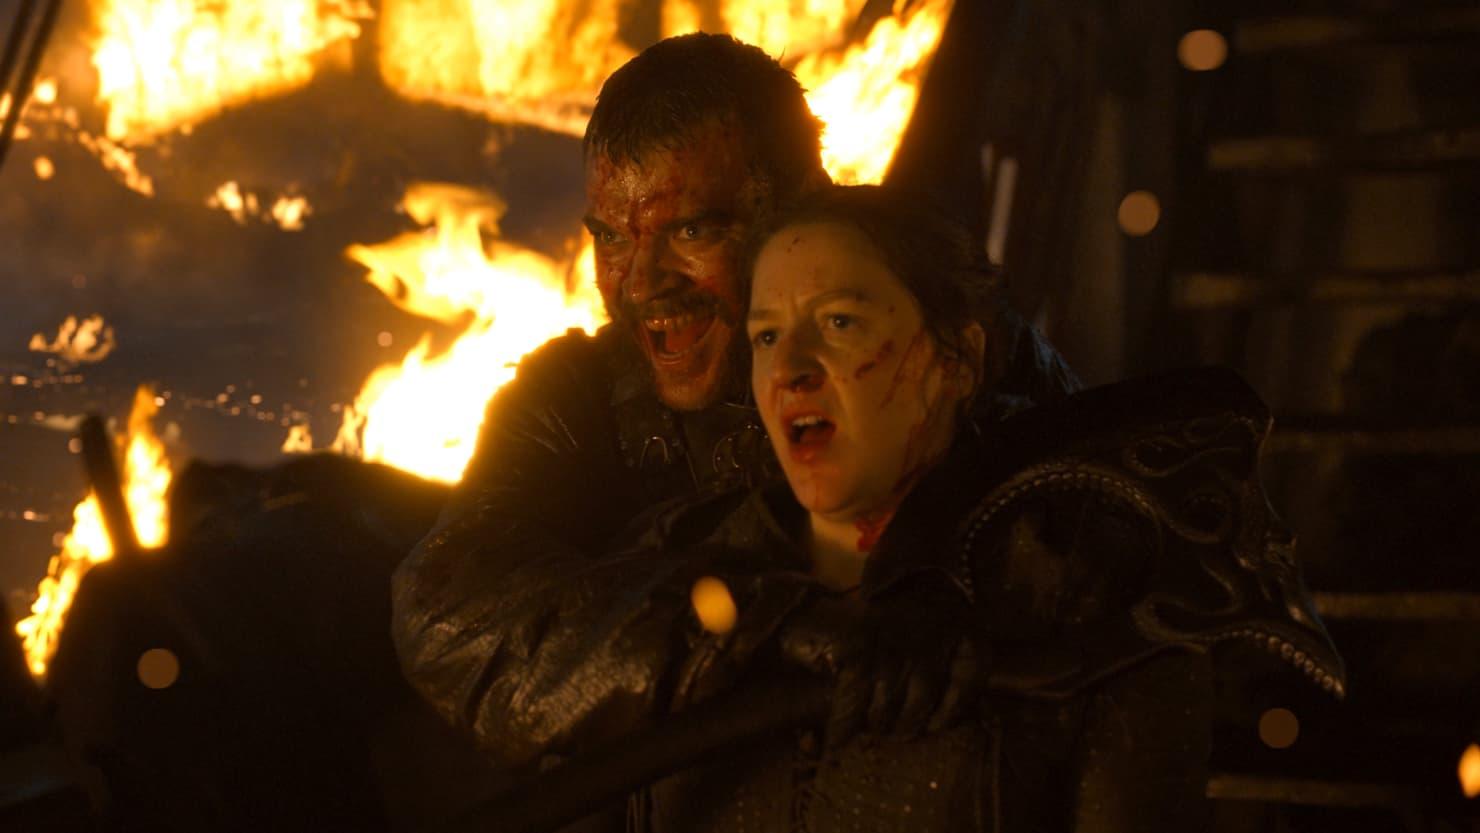 Euron and Yara Greyjoy in 'Stormborn'